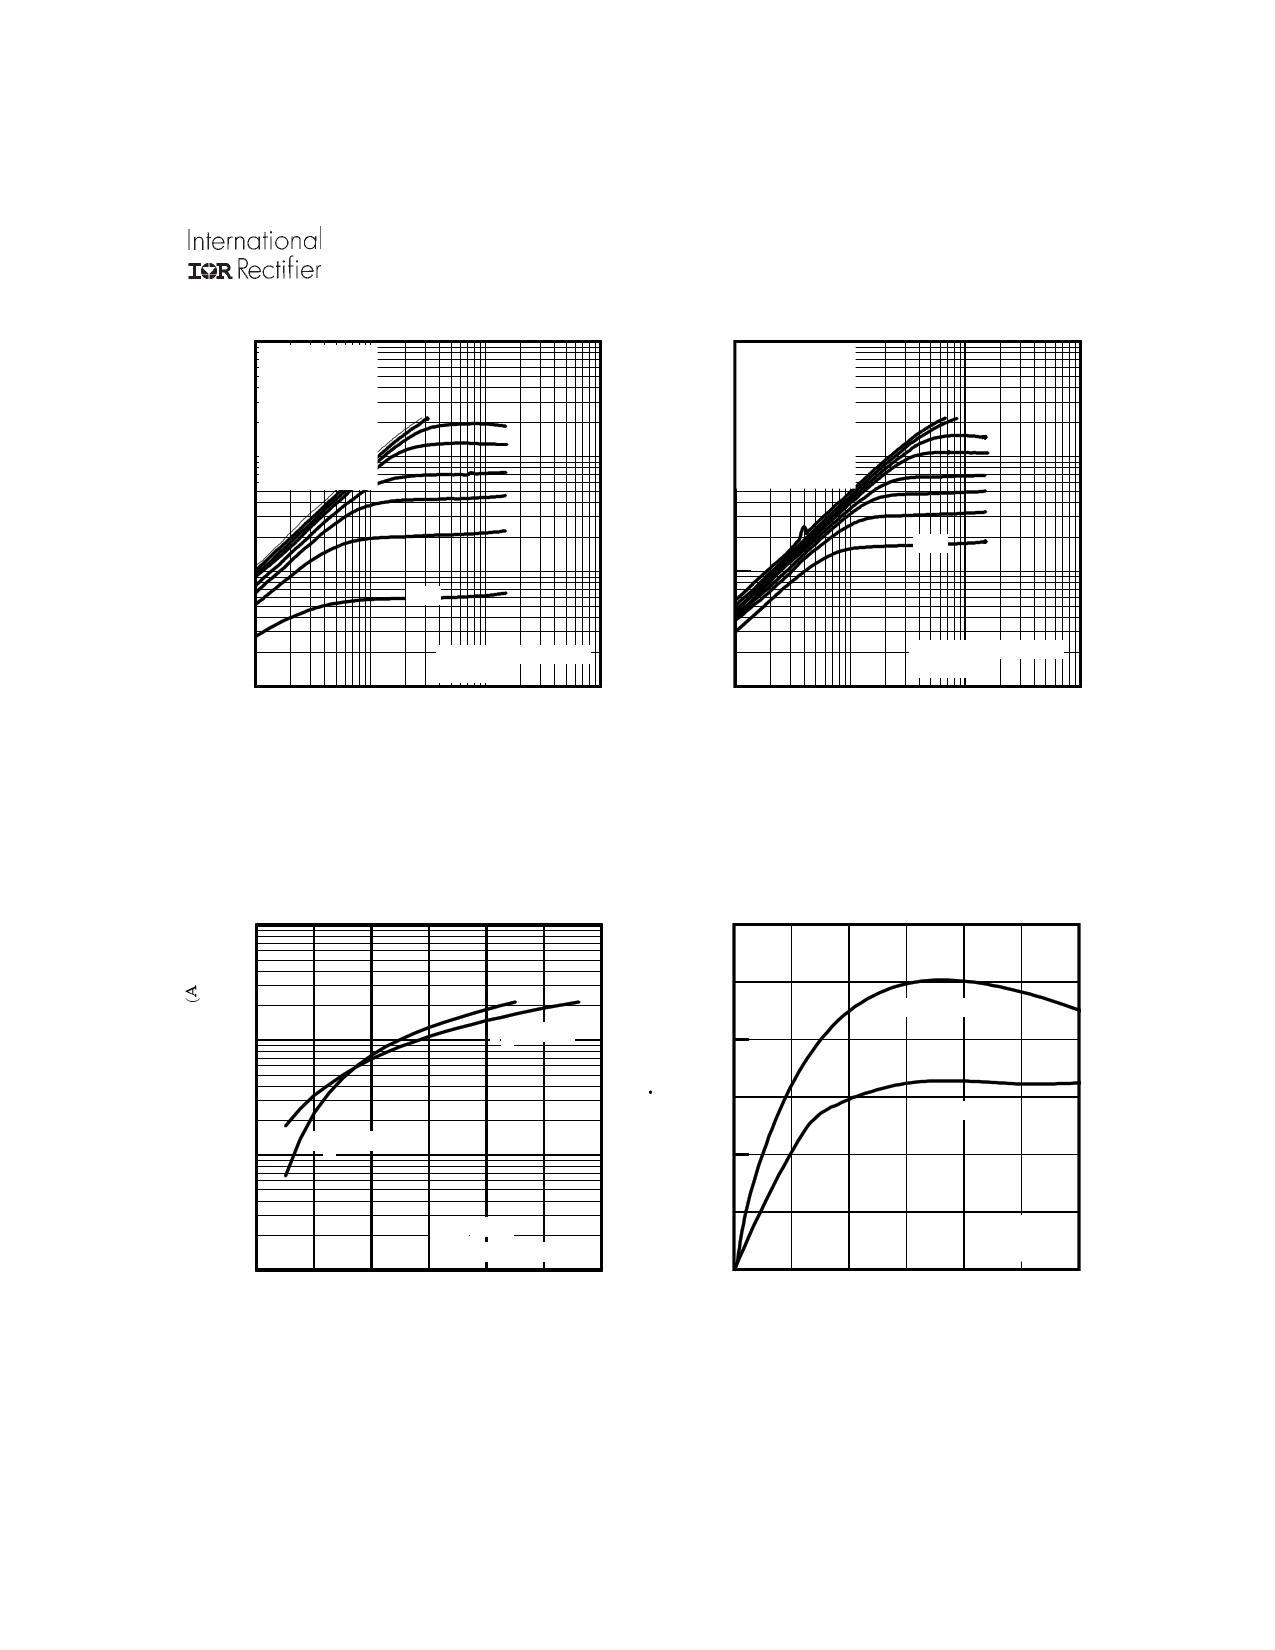 IRFZ46ZS pdf, ピン配列